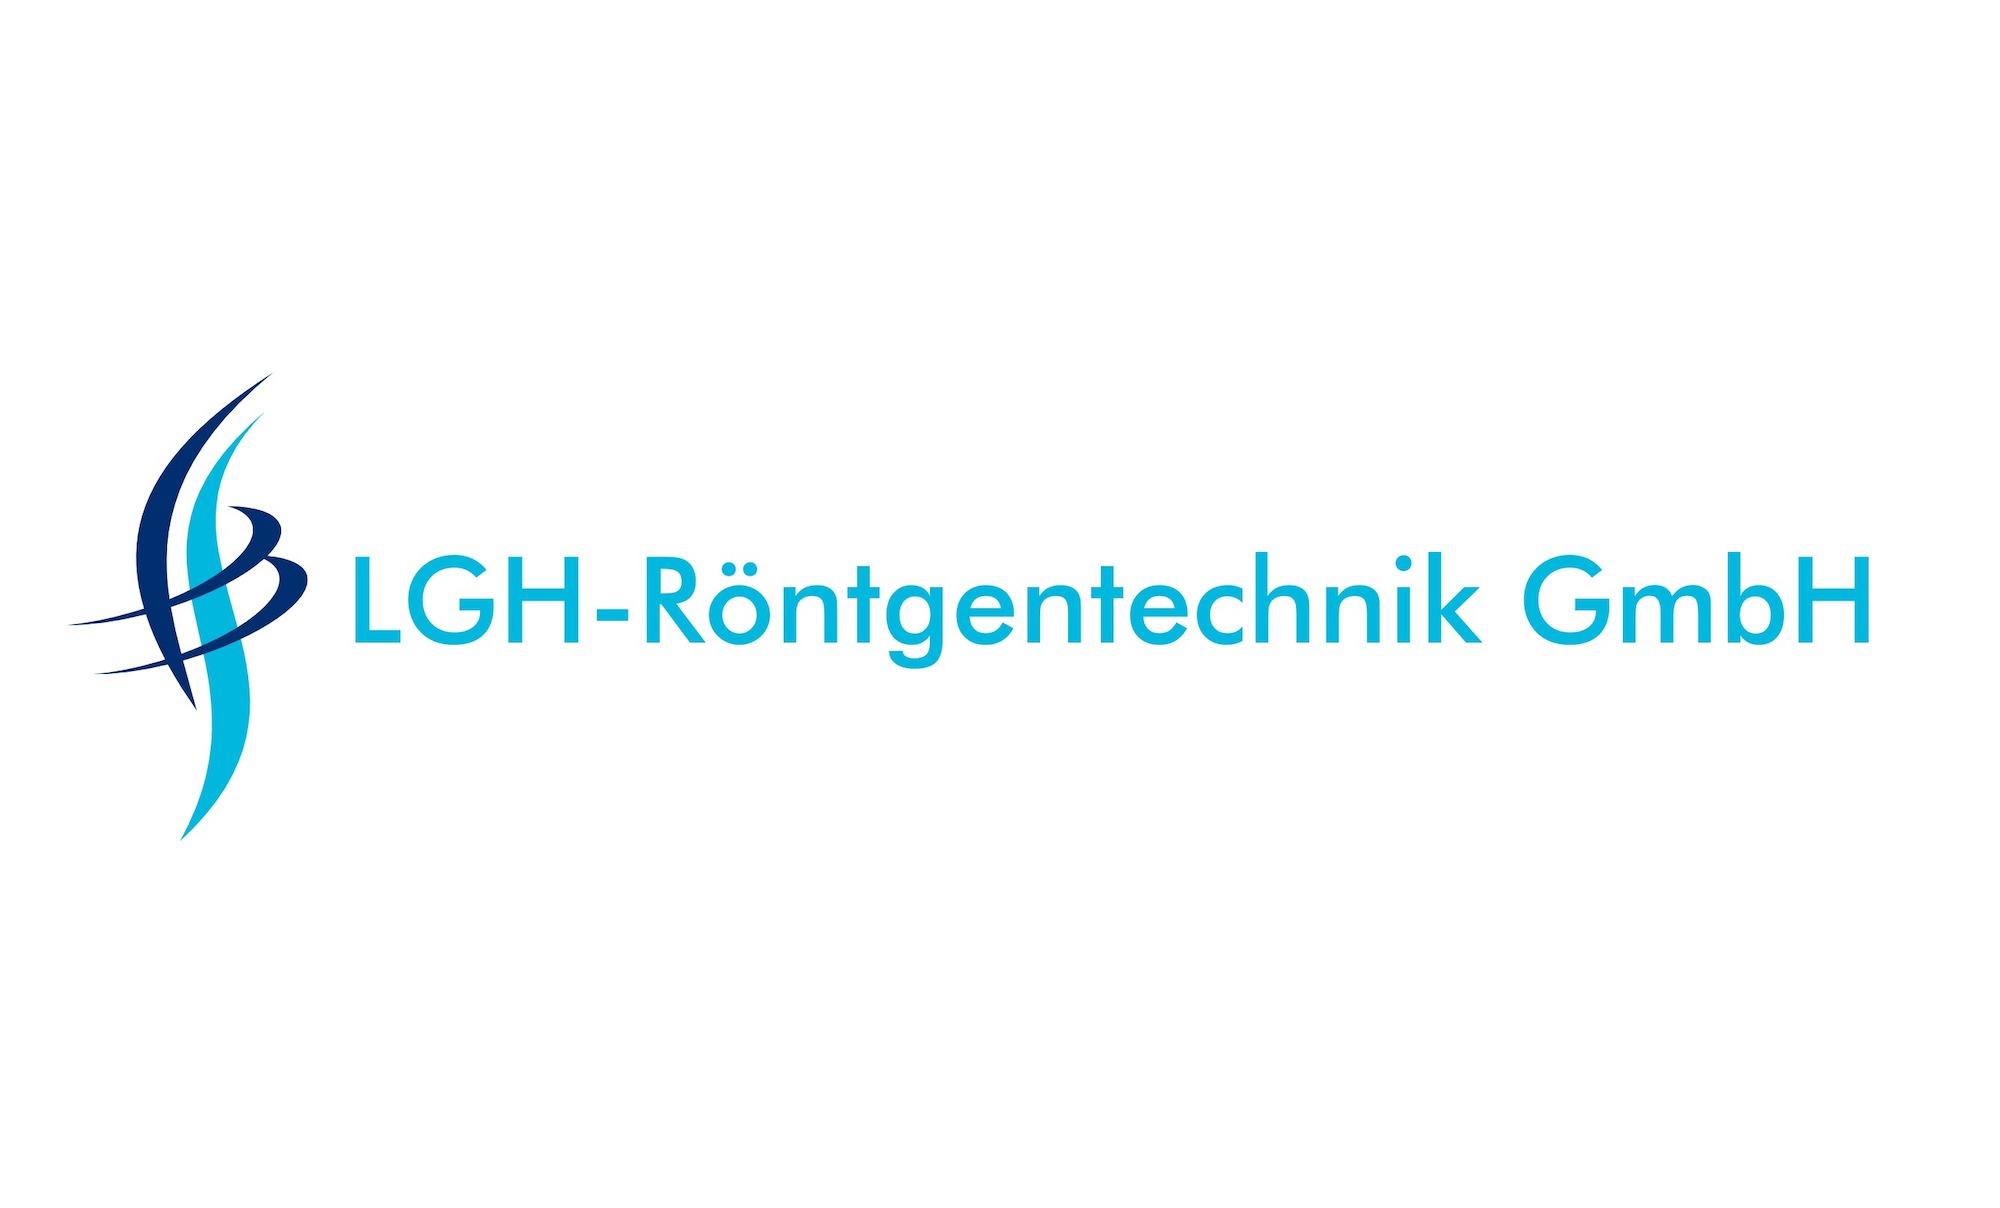 LGH-Röntgentechnik